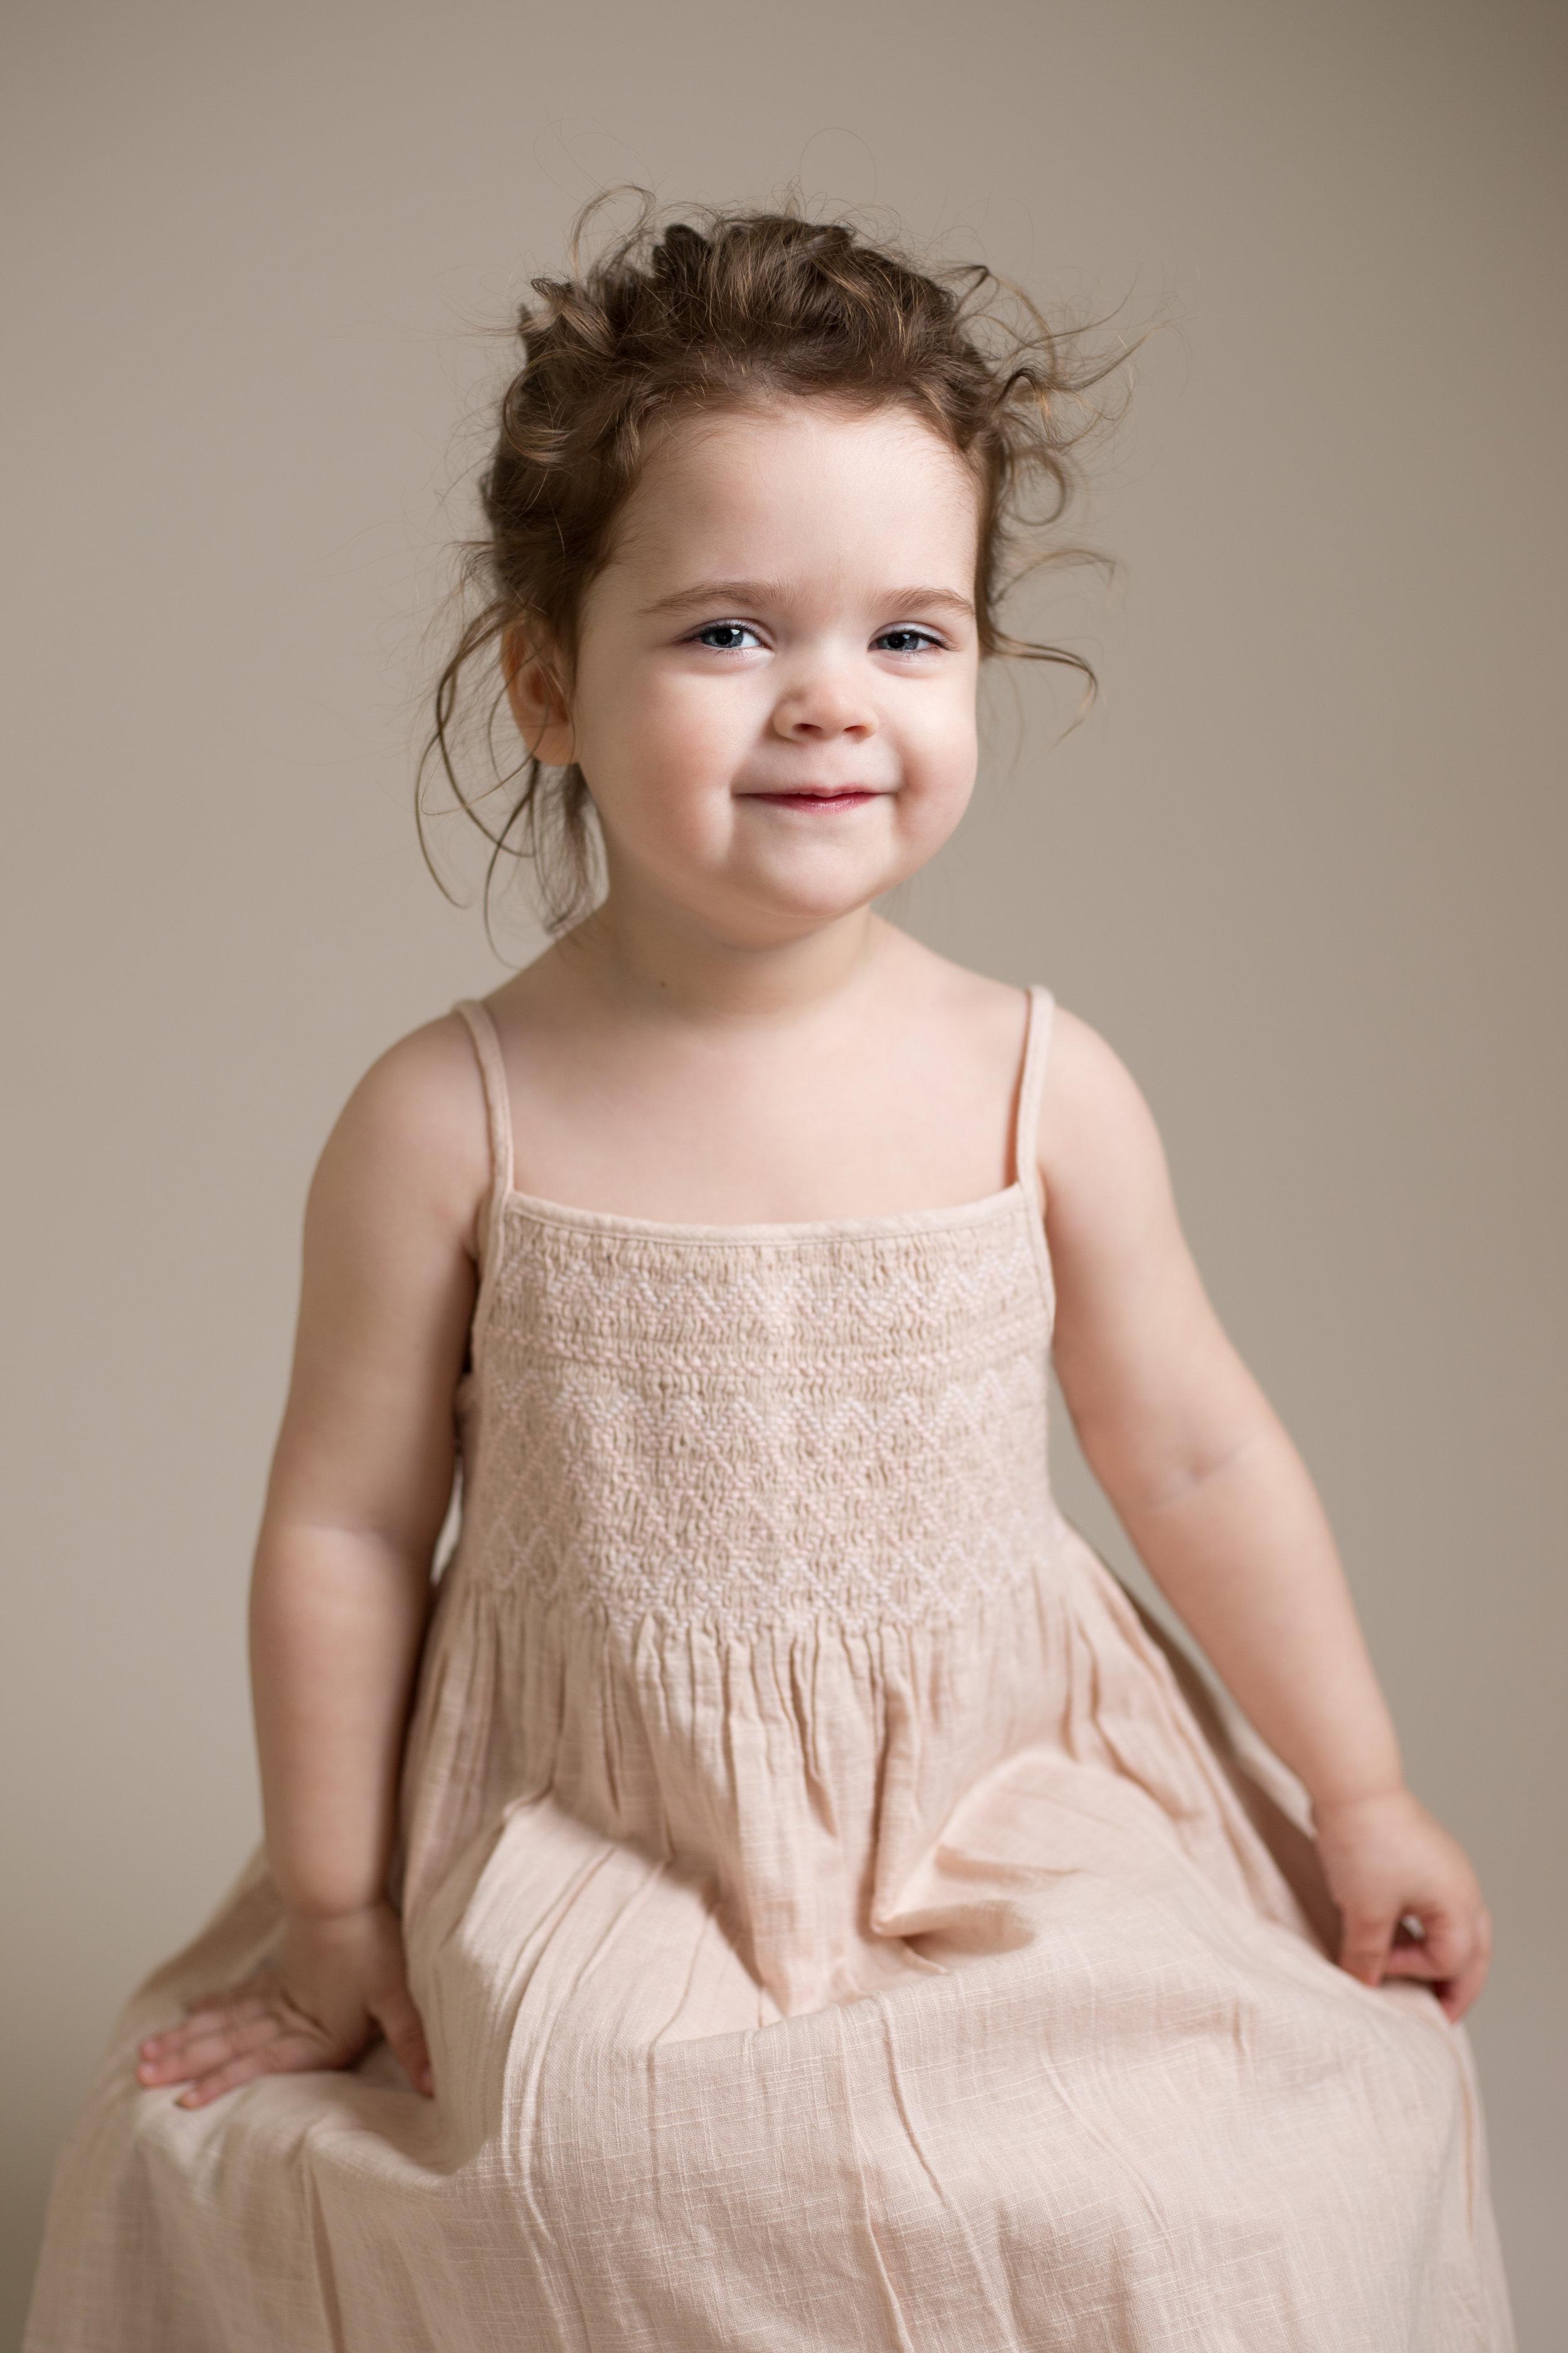 LEA-COOPER-PHOTOGRAPHY-WILLENHALL-WEST-MIDLANDS-WOLVERHAMPTON-CHILDREN-SESSION-WOLVERHAMPTON-BIRMINGHAM-PINK-GIRL-SMILING.jpg